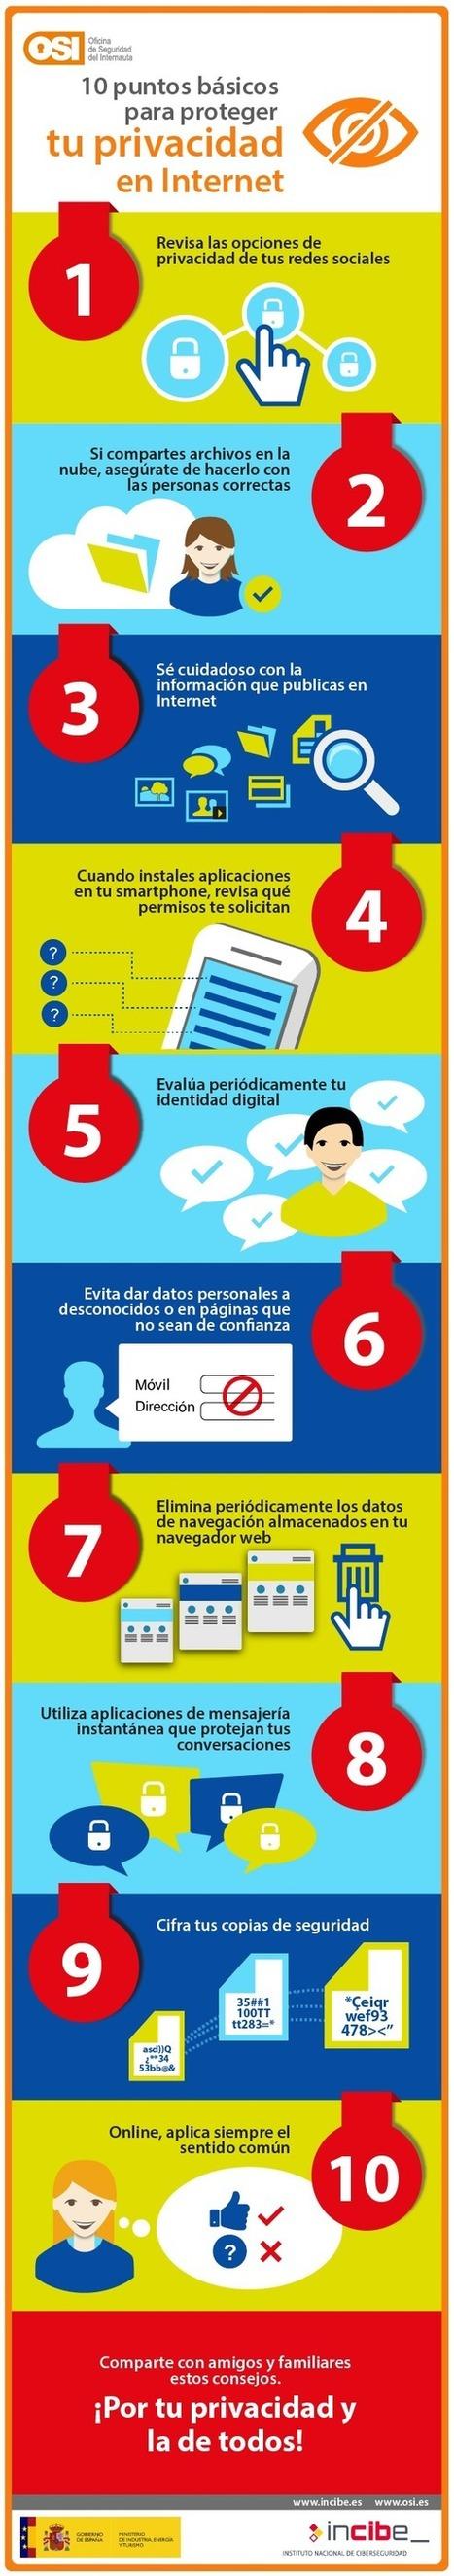 10 puntos básicos para proteger tu seguridad en Internet #infografia #infographic | Wallet Digital - Social Media, Business & Technology | Scoop.it